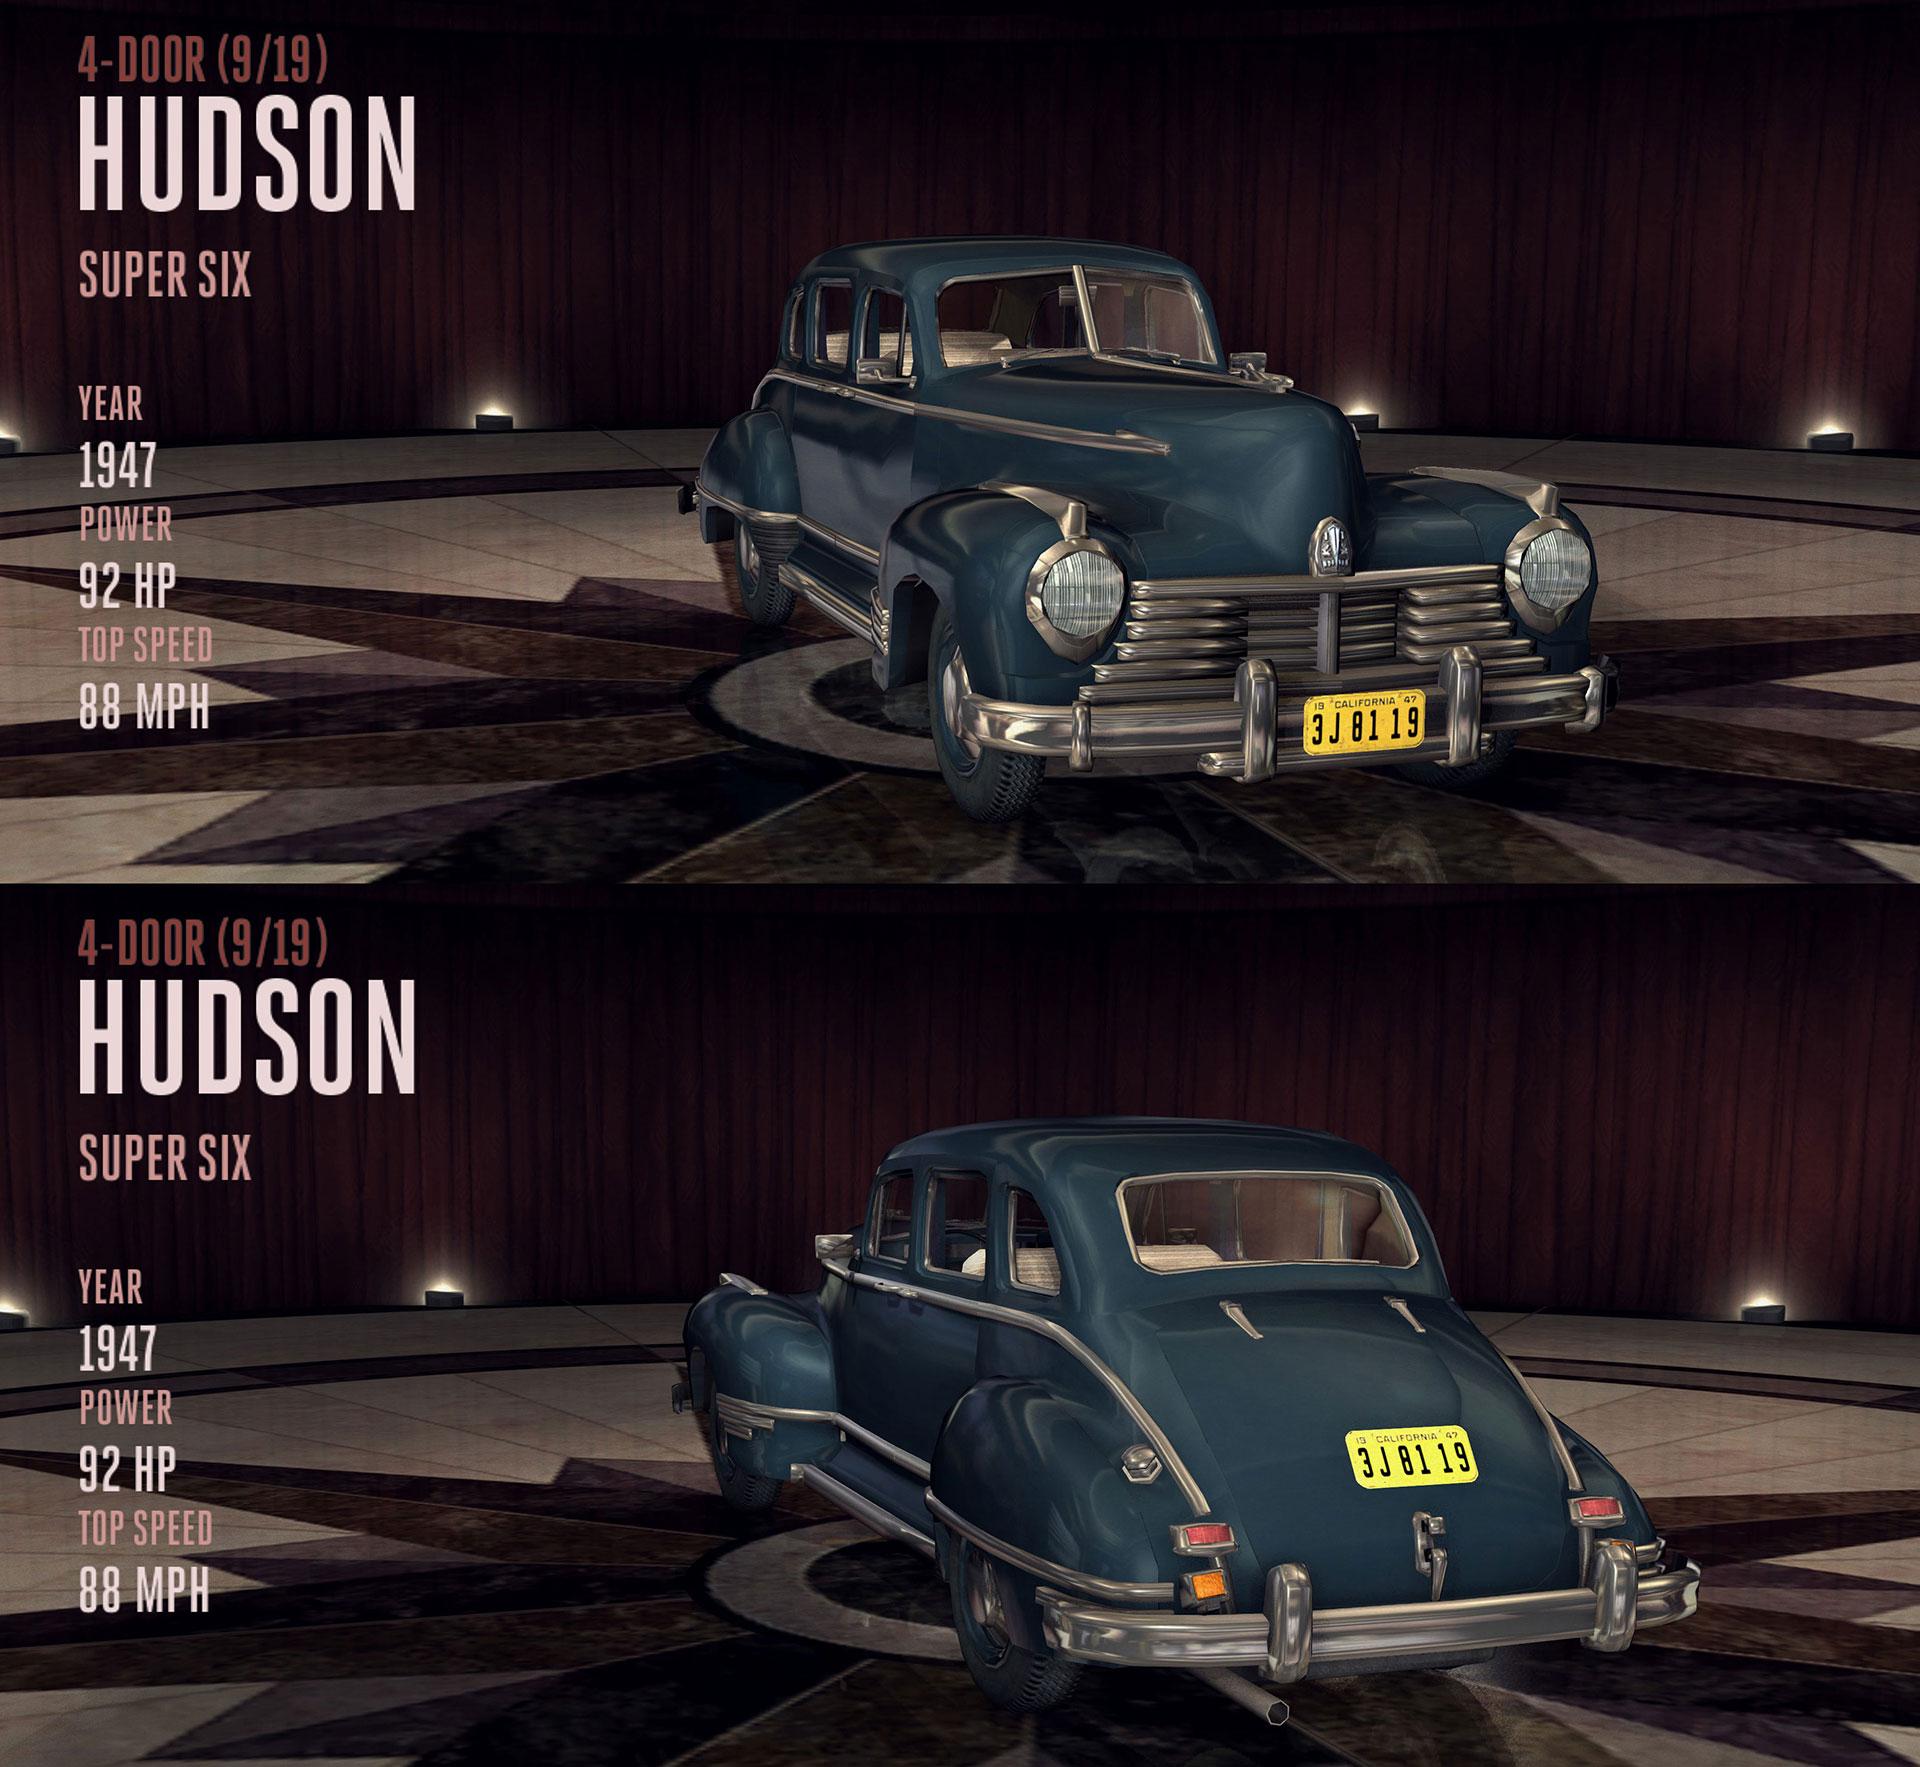 Archivo:1947-hudson-super-six.jpg